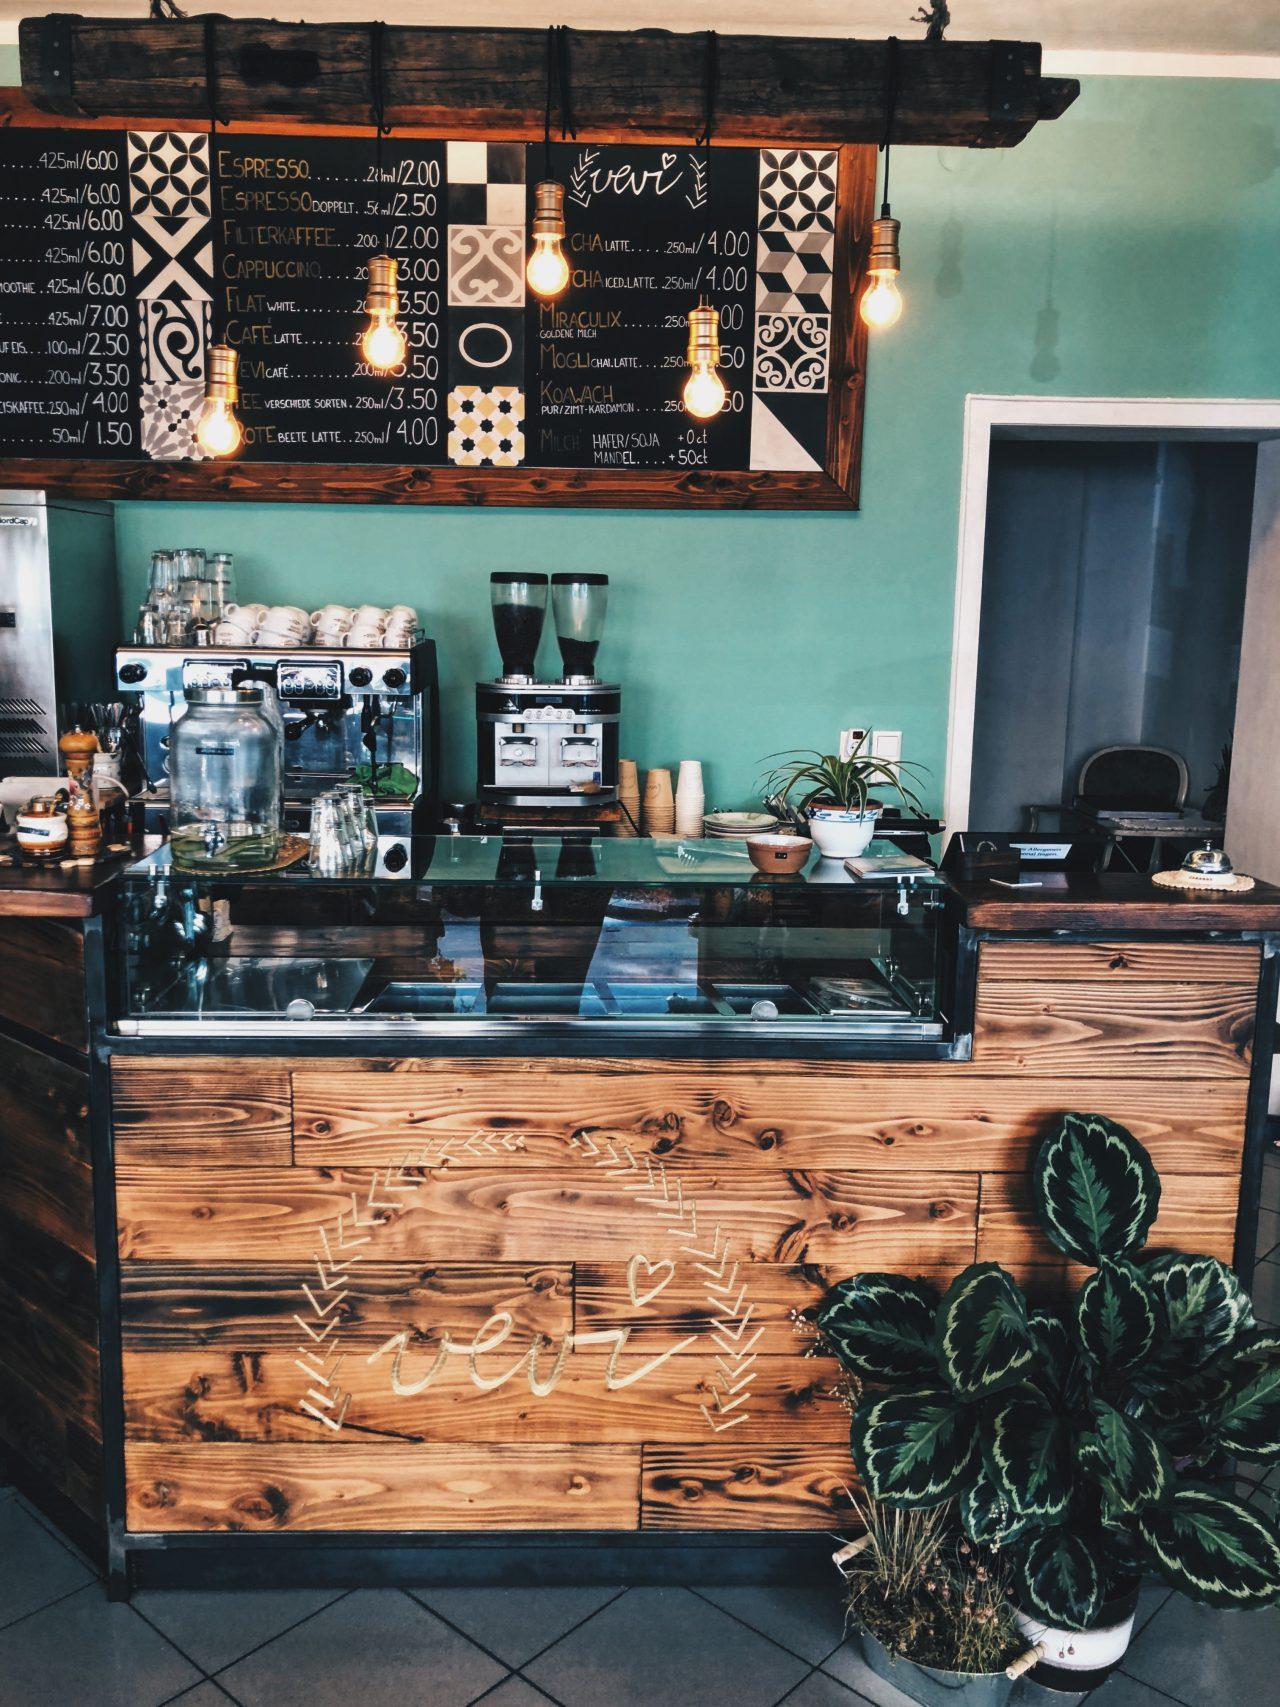 koeln beste gag cafe vevi jessica knetsch menschen 5